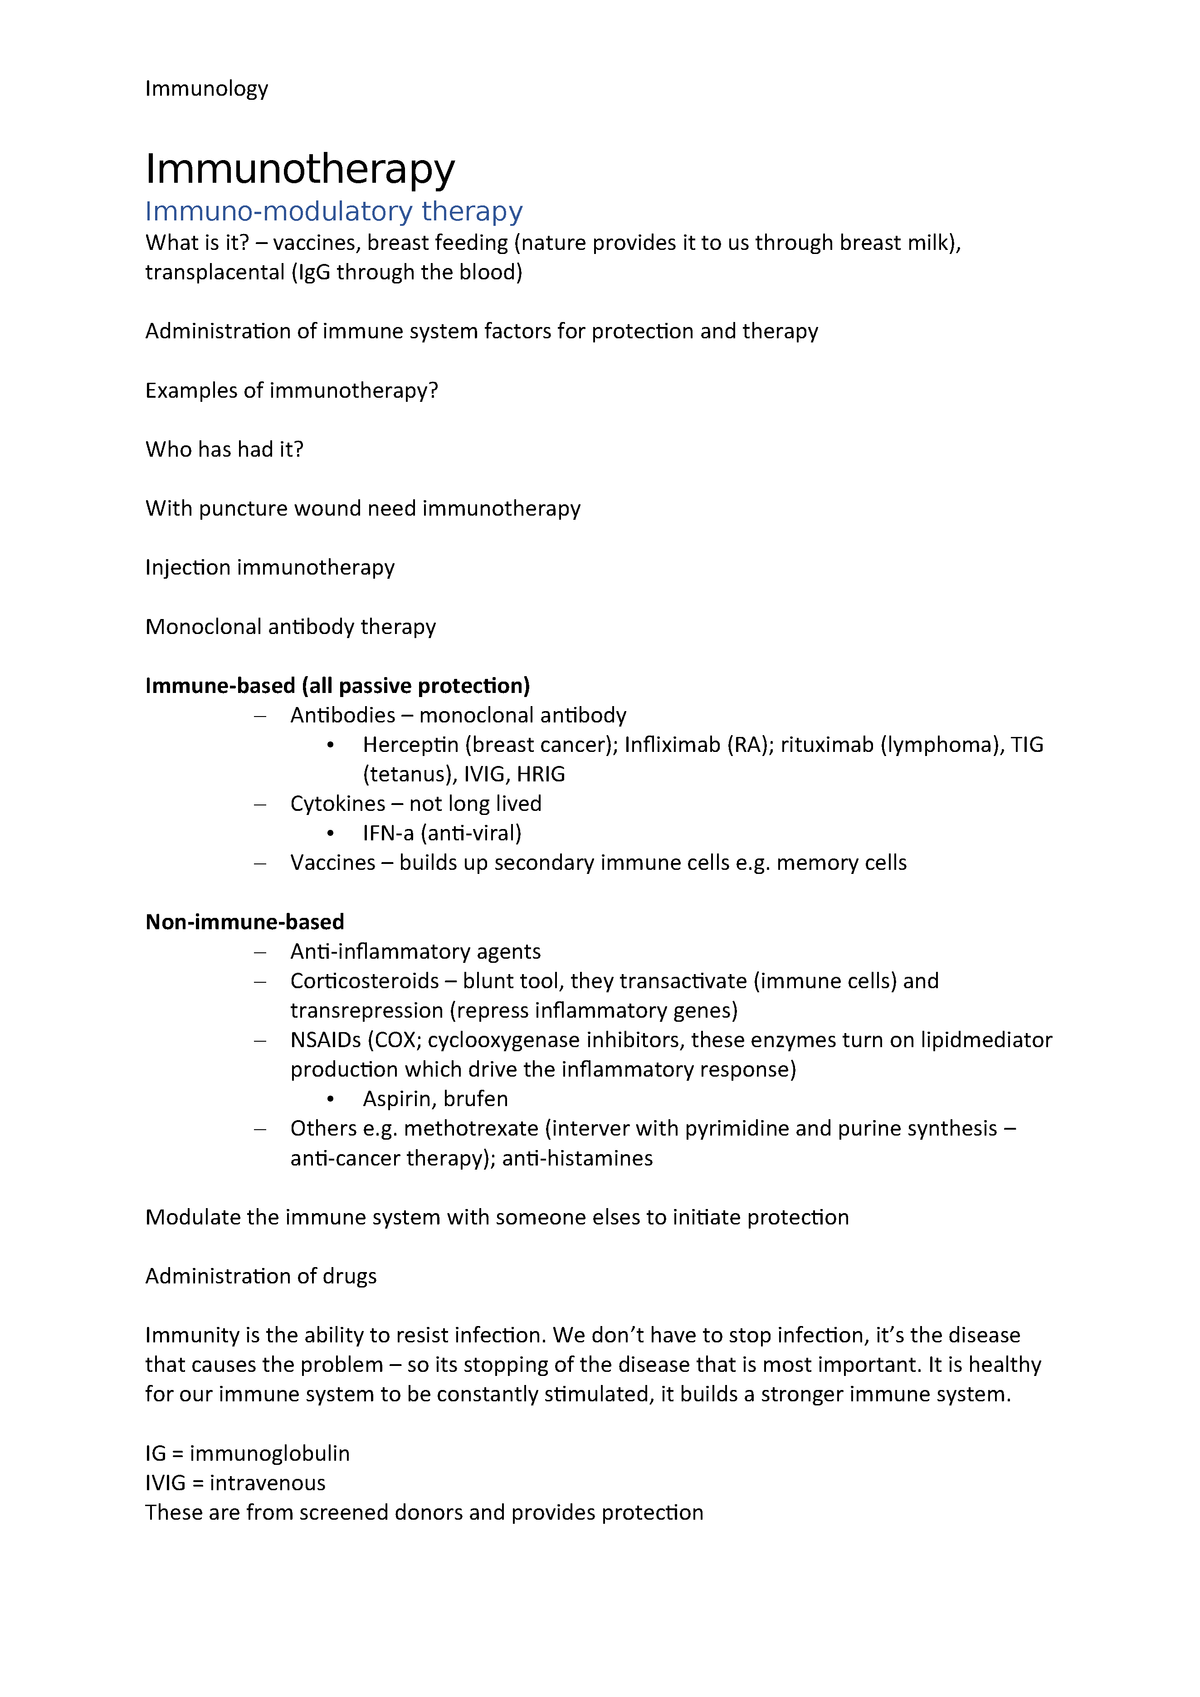 Immunology Immunotherapy - BY2IM1 - Aston - StuDocu